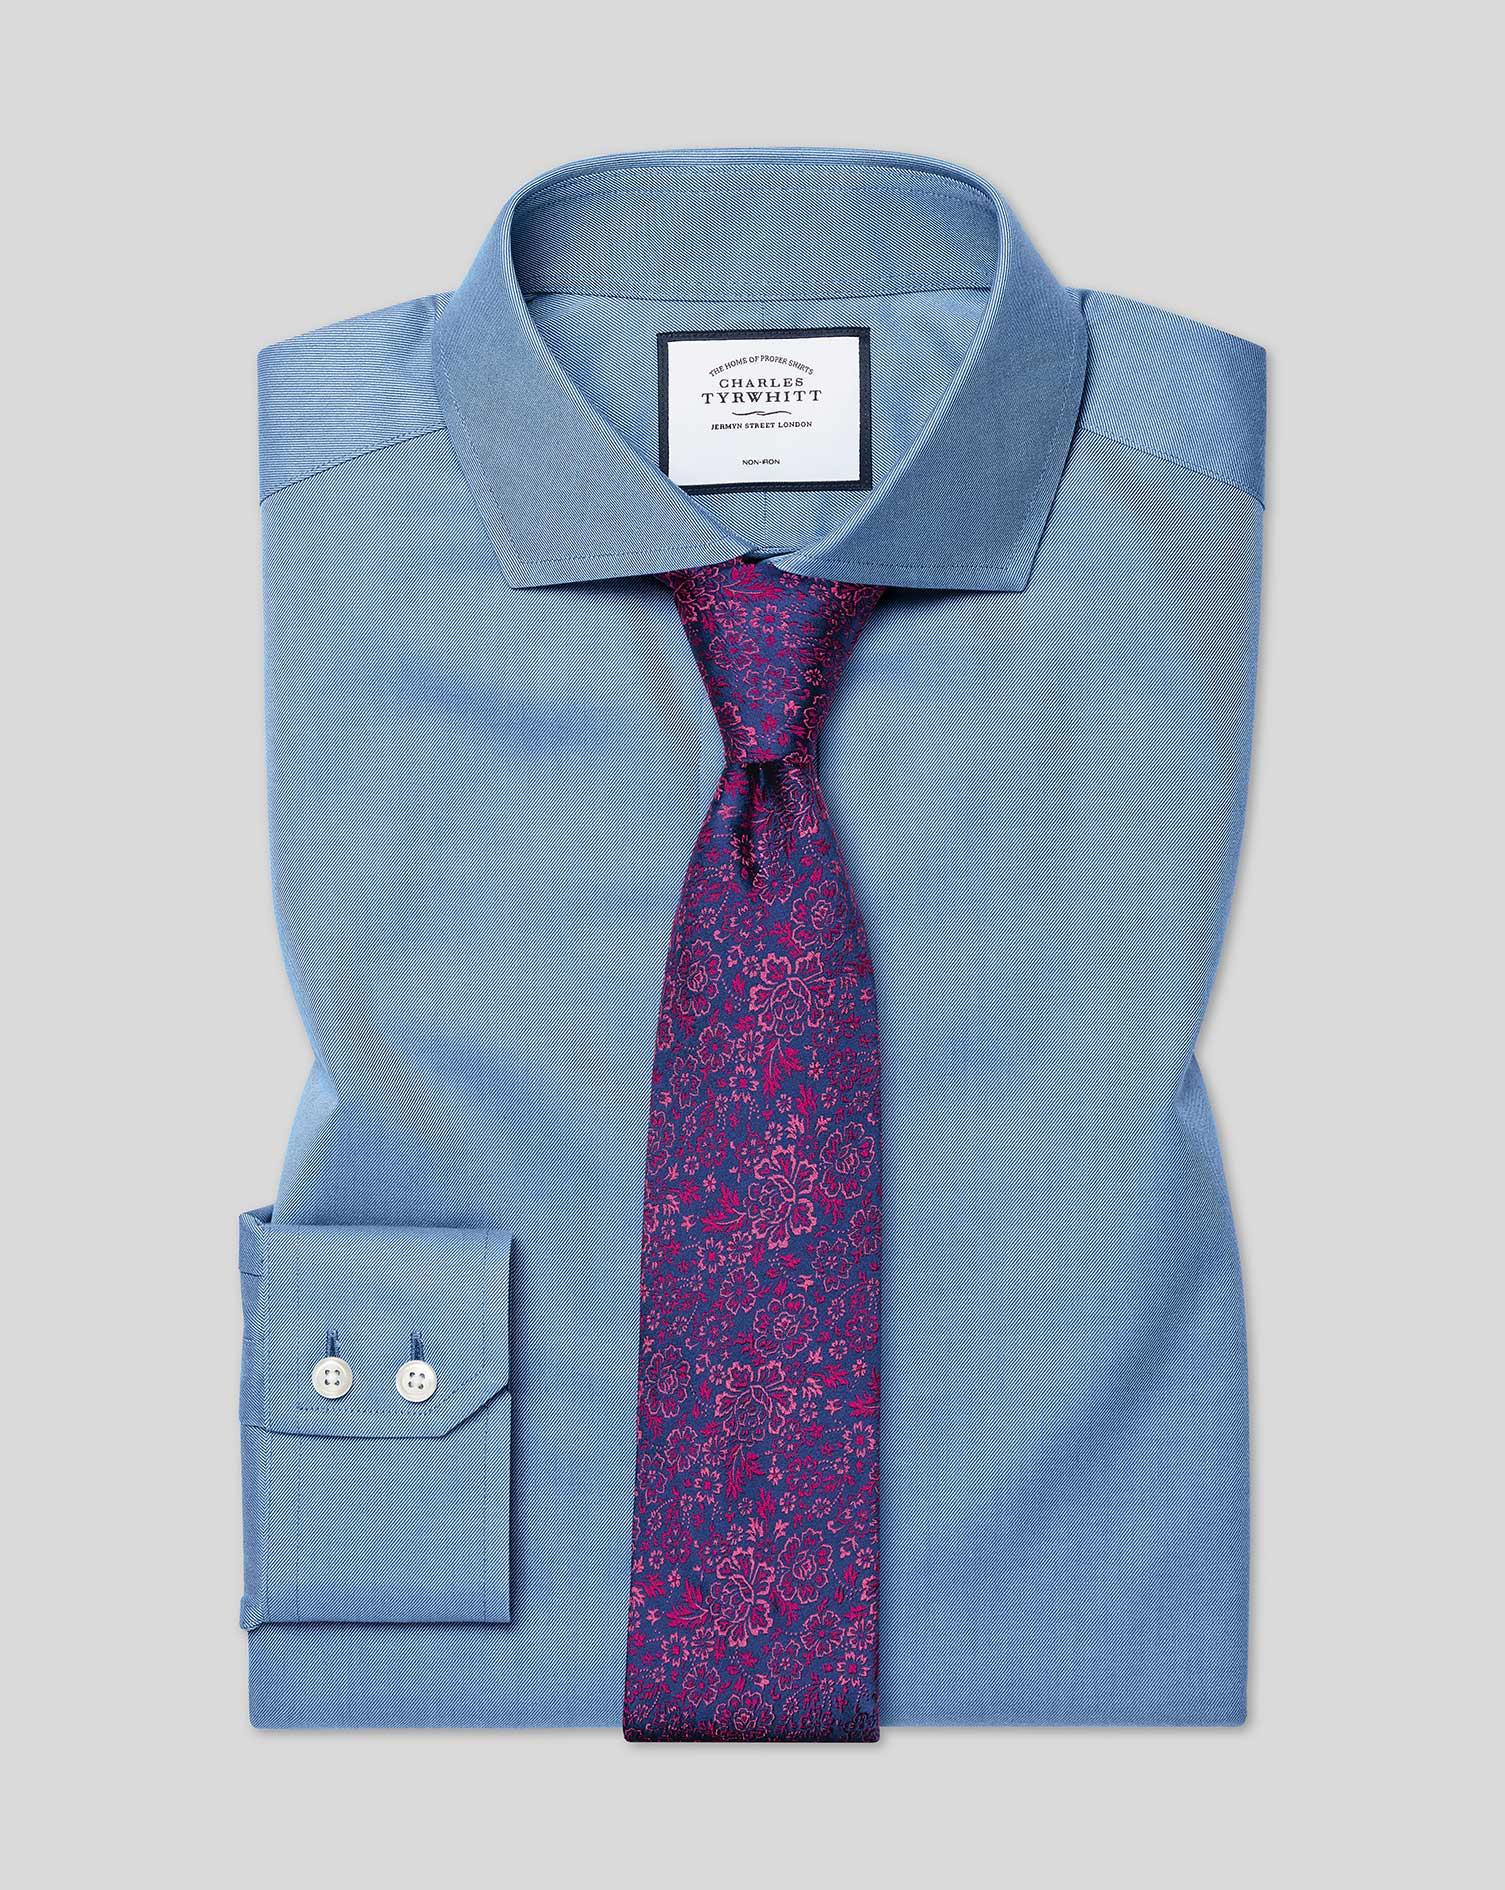 Cotton Slim Fit Non-Iron Cutaway Twill Blue Shirt